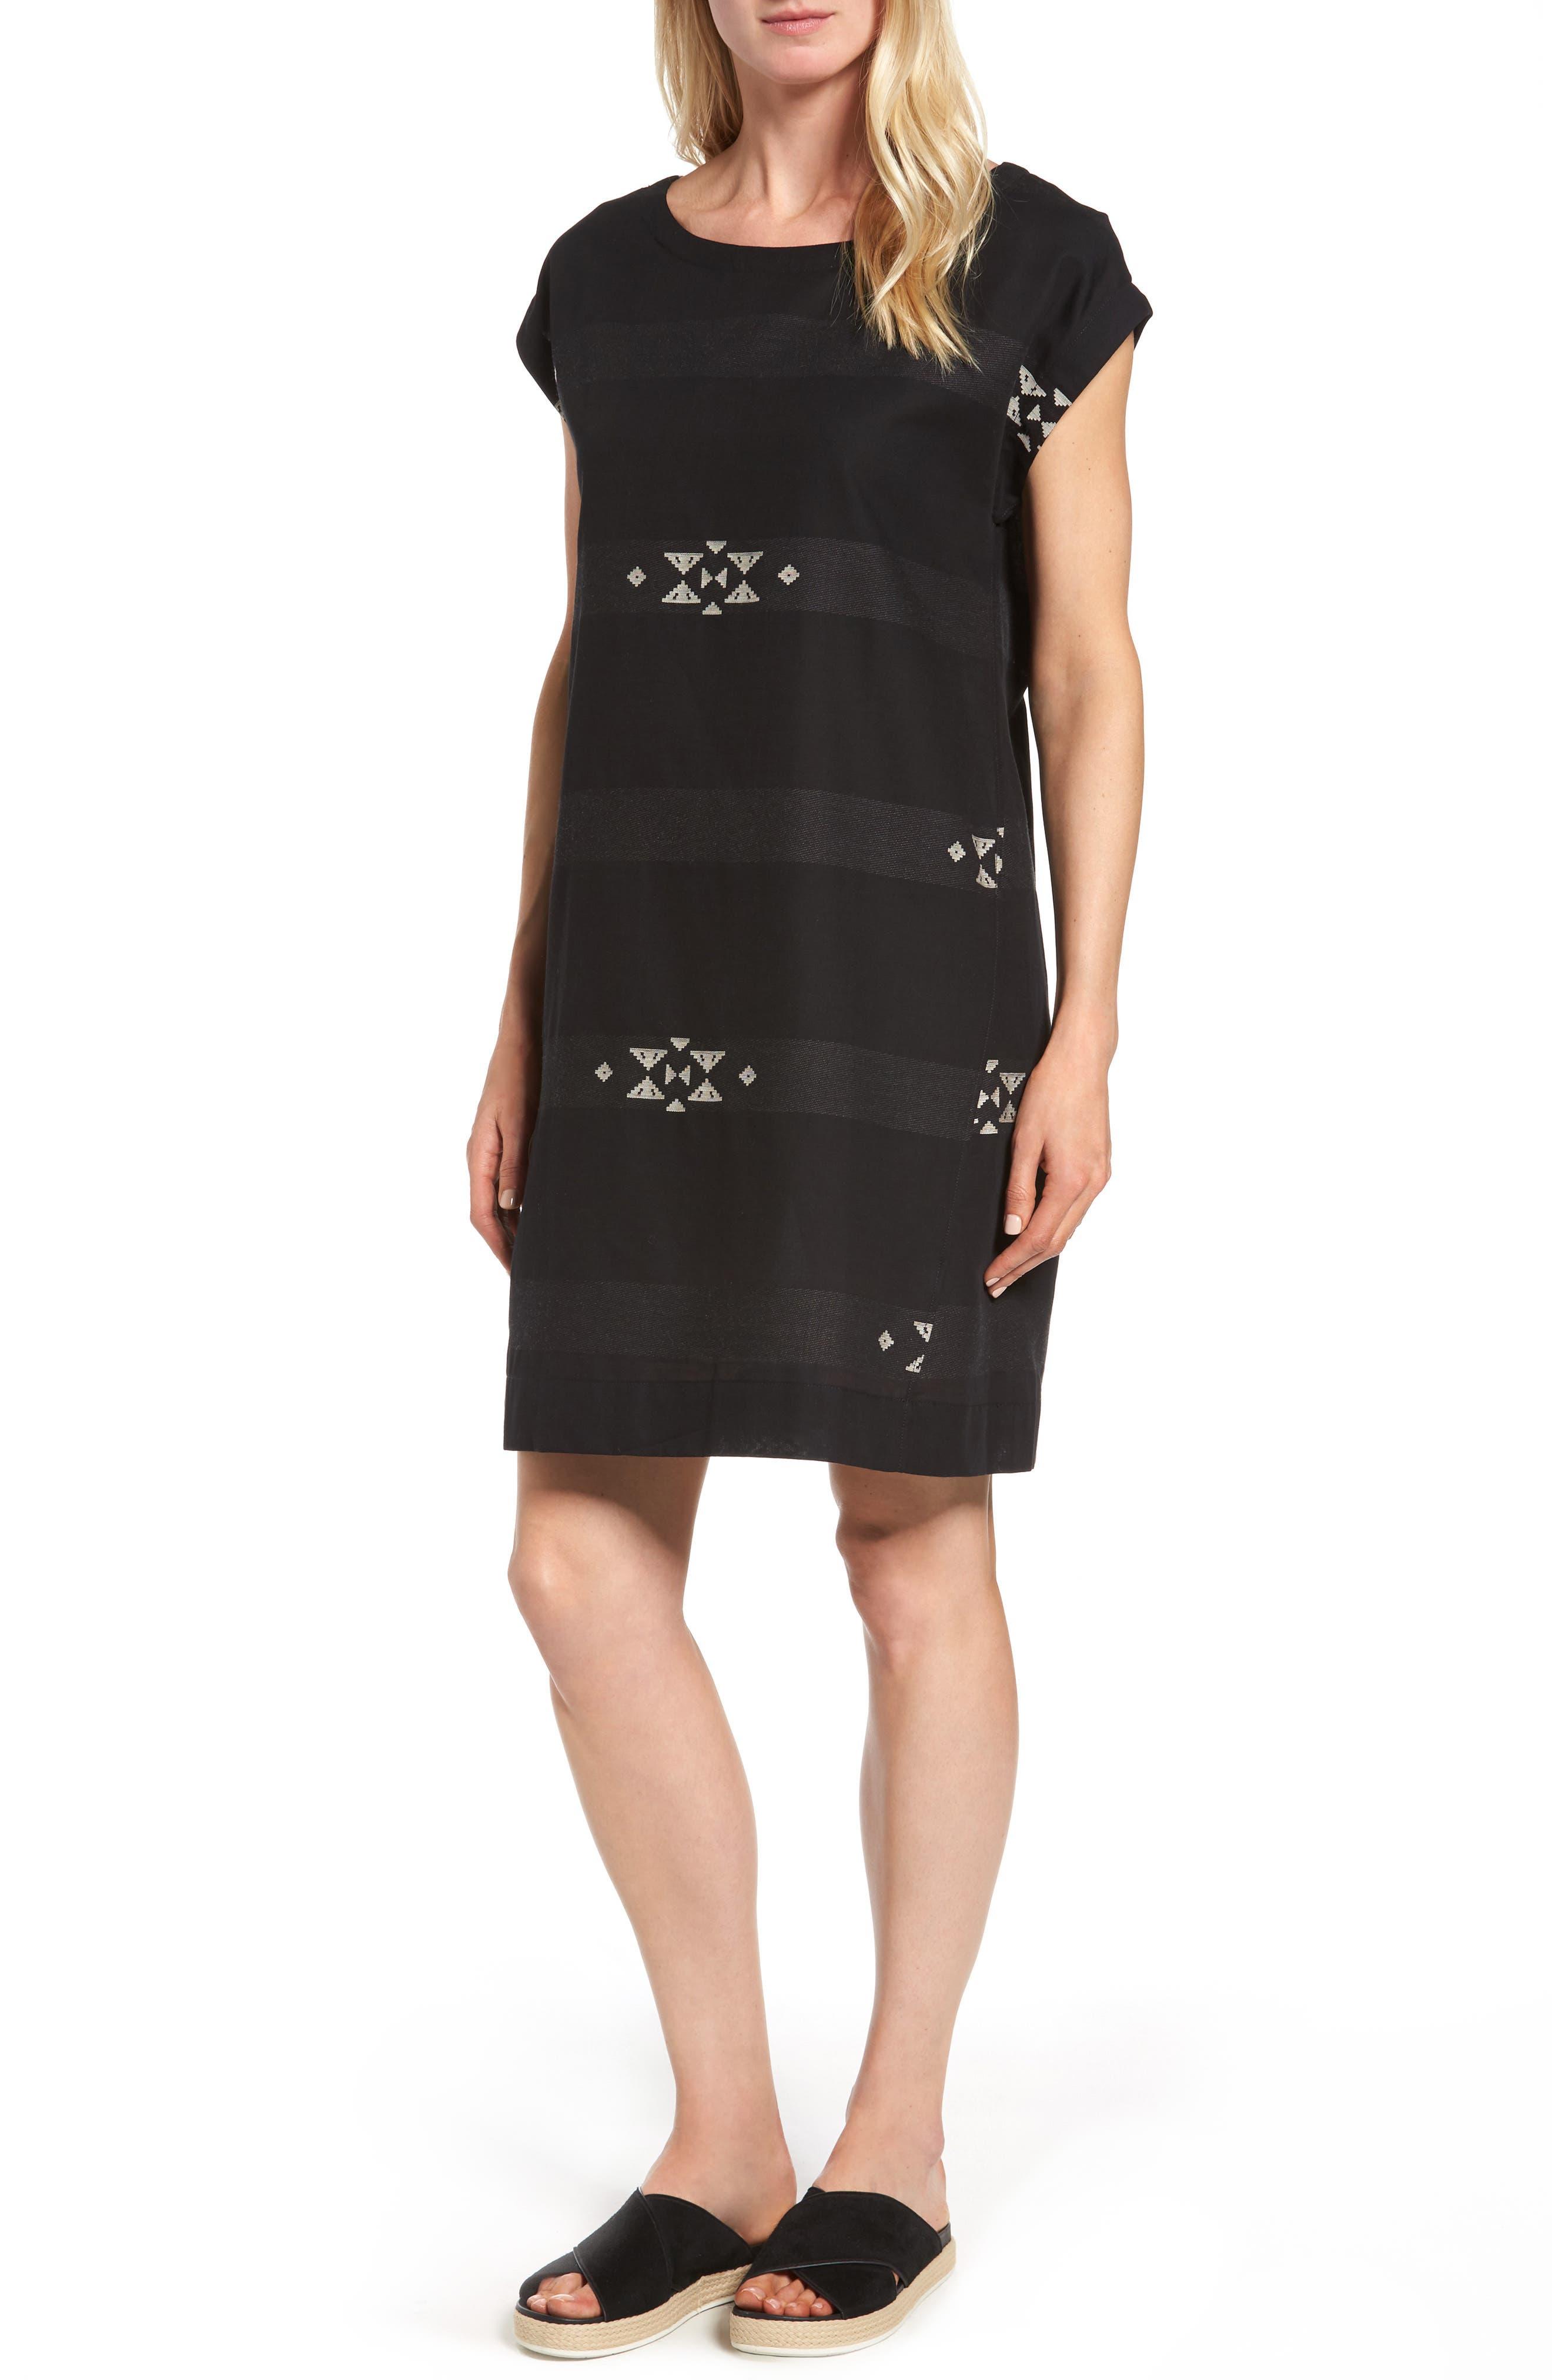 Alternate Image 1 Selected - Eileen Fisher Cotton Jacquard Shirt Dress (Regular & Petite)